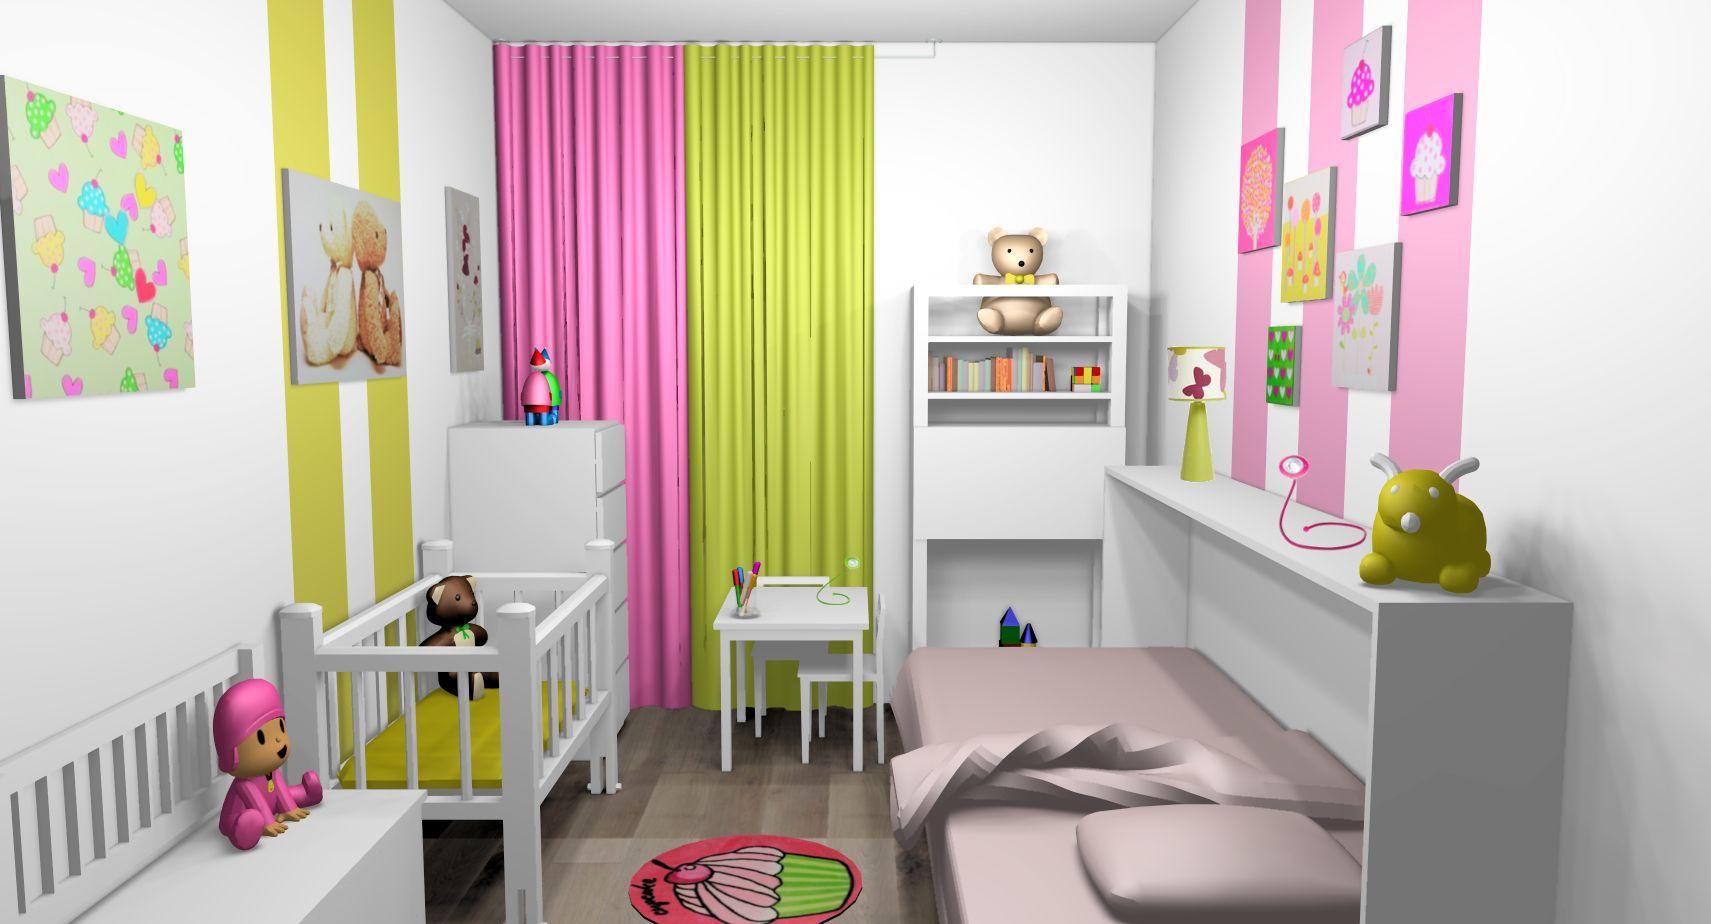 chambre mixte fille b b bandes peinture touches vert anis rose 1711 924 deco chambre. Black Bedroom Furniture Sets. Home Design Ideas